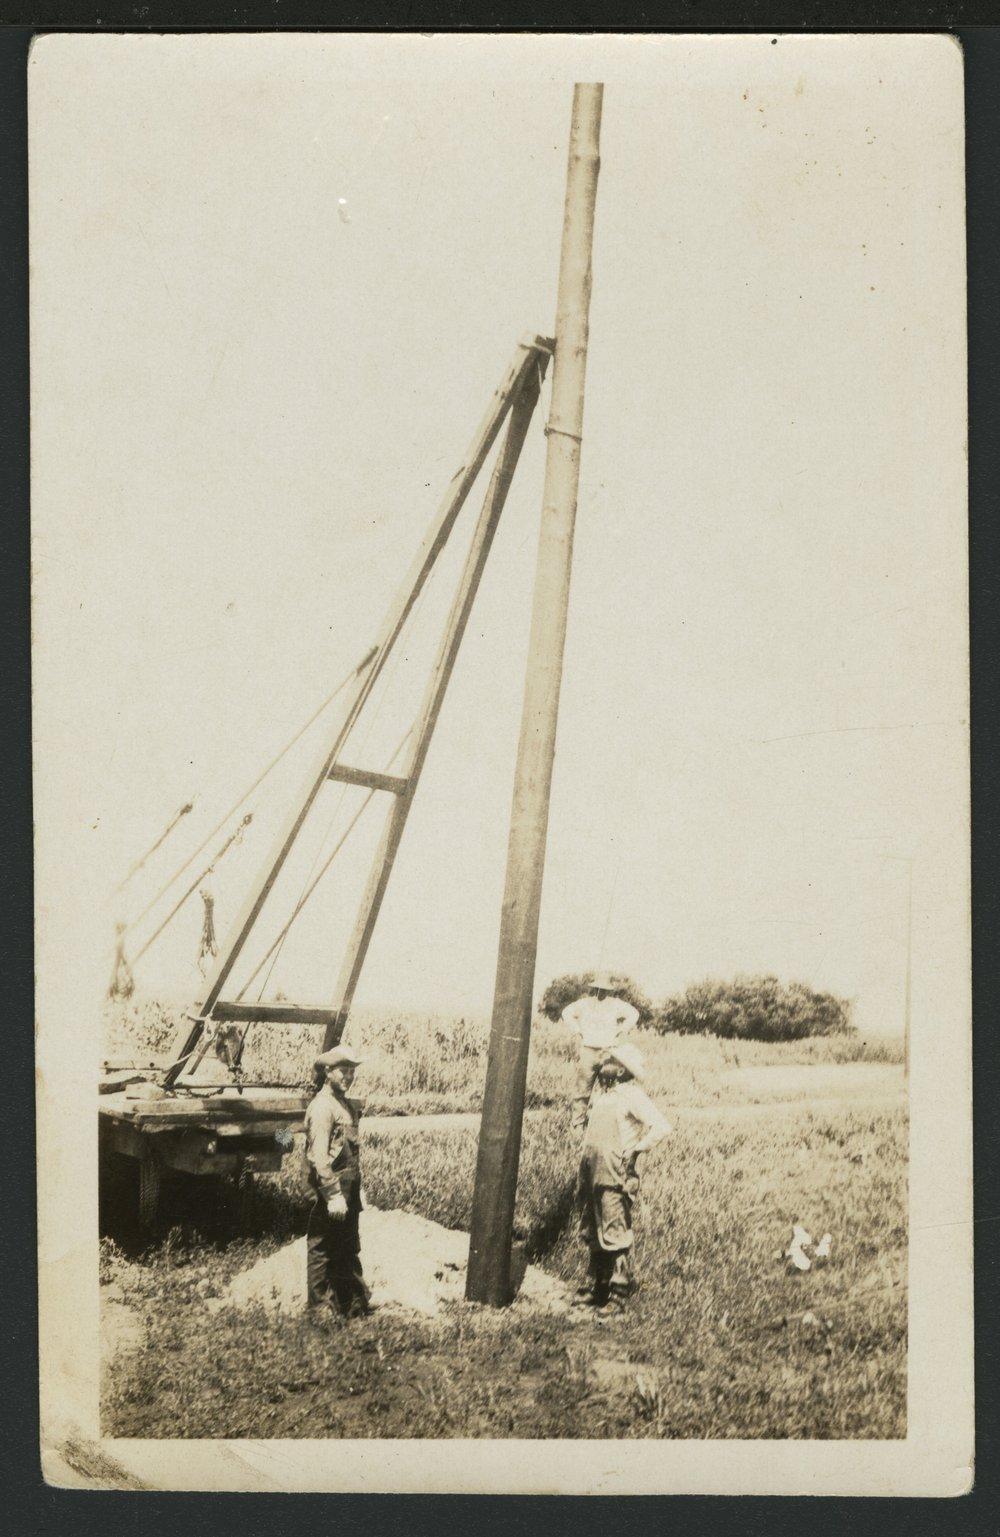 Kansas dickinson county solomon - Setting An Electric Pole Near Solomon Kansas